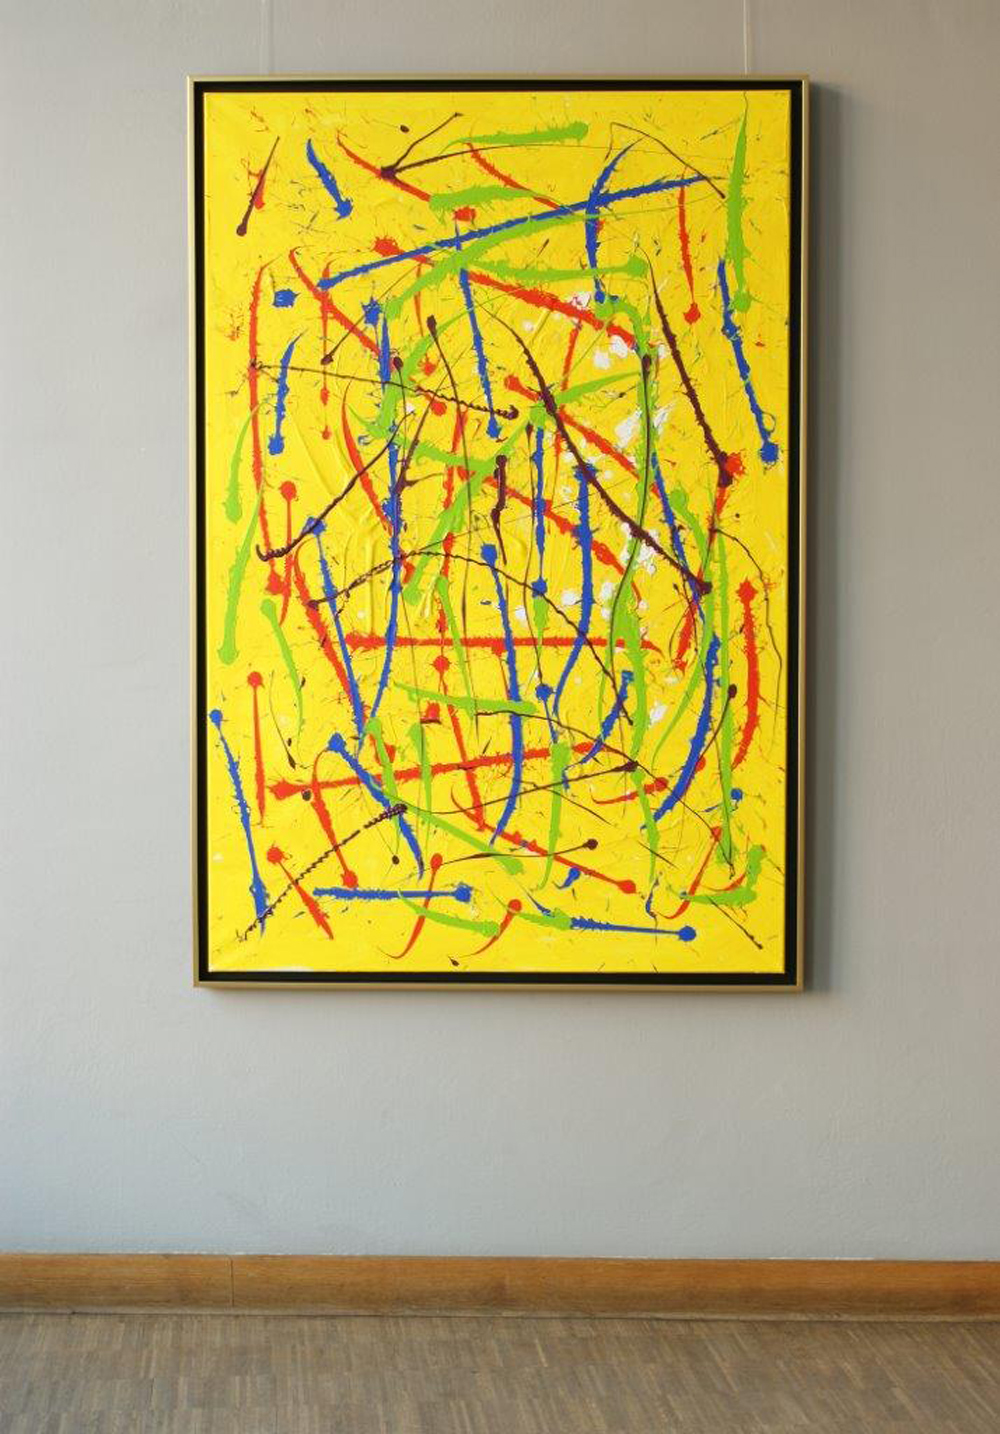 Edward Dwurnik : Painting no 459